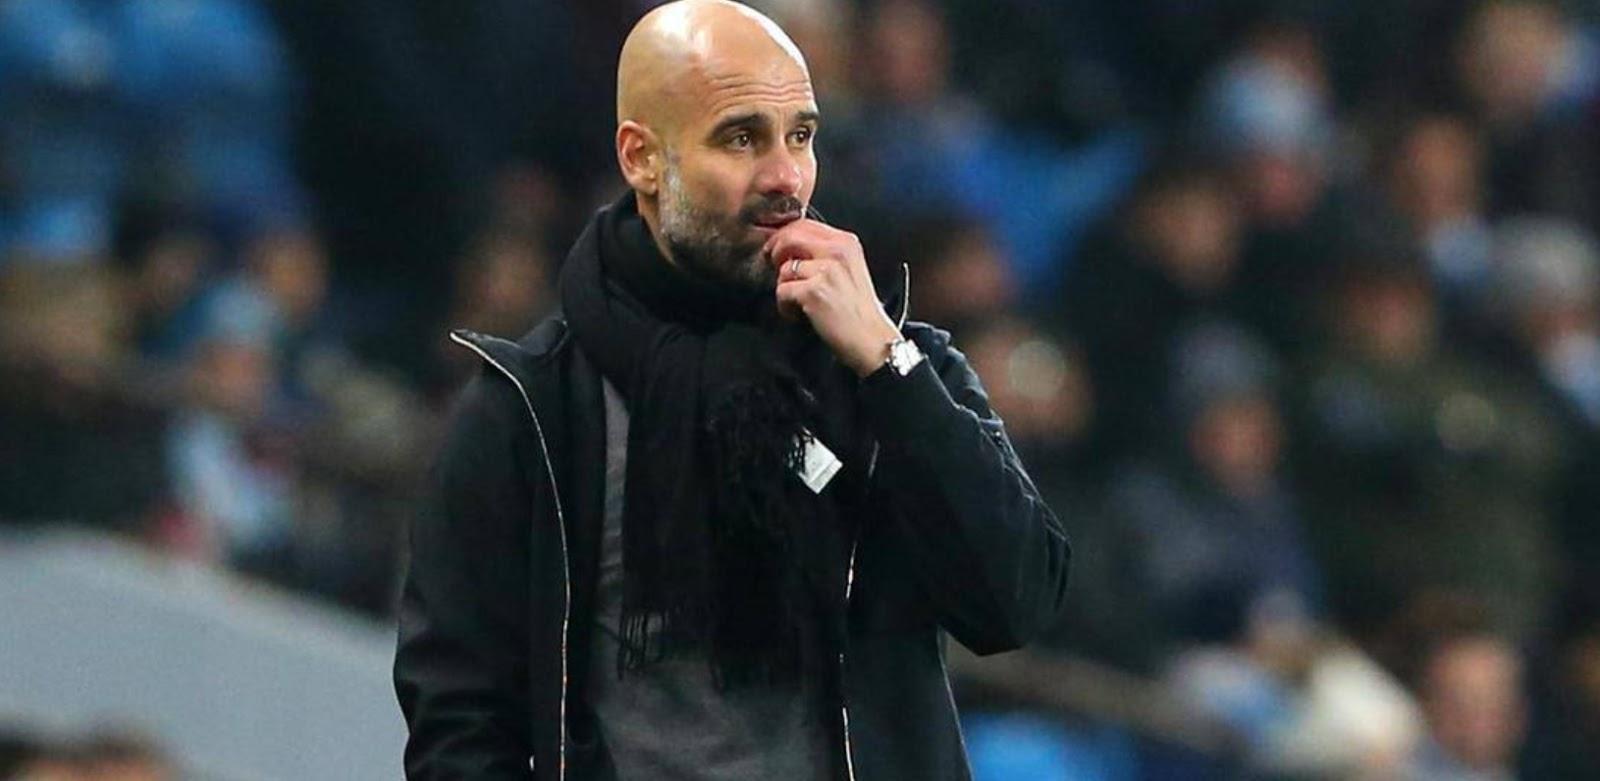 Pep Guardiola 2020 Man City Contract